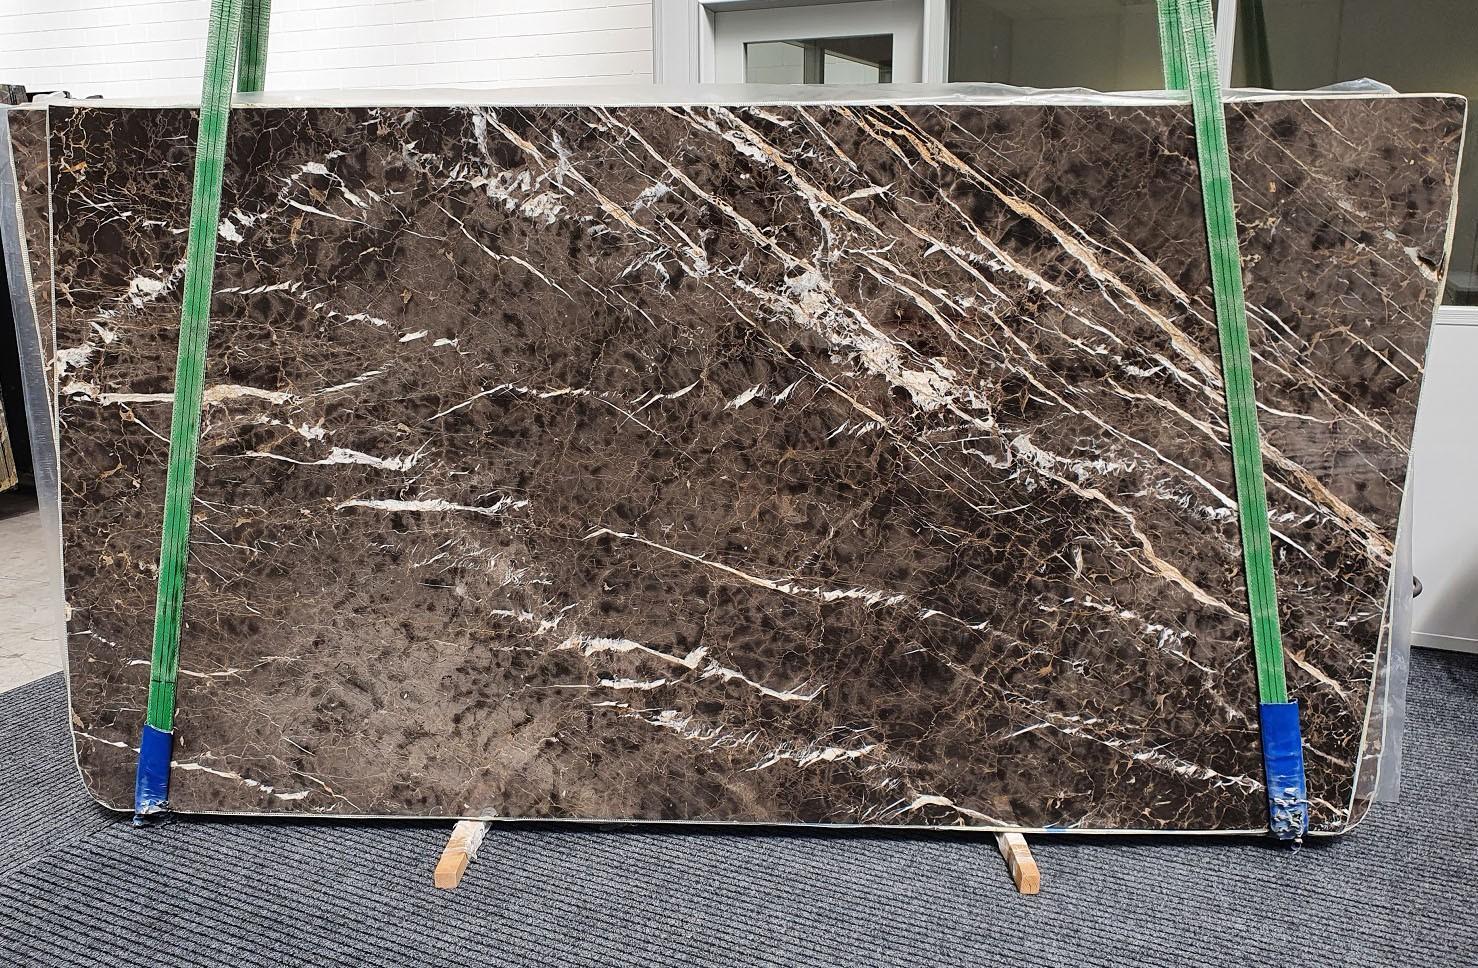 MARRON IRIS Supply Veneto (Italy) polished slabs 1404 , Slab #34 natural marble